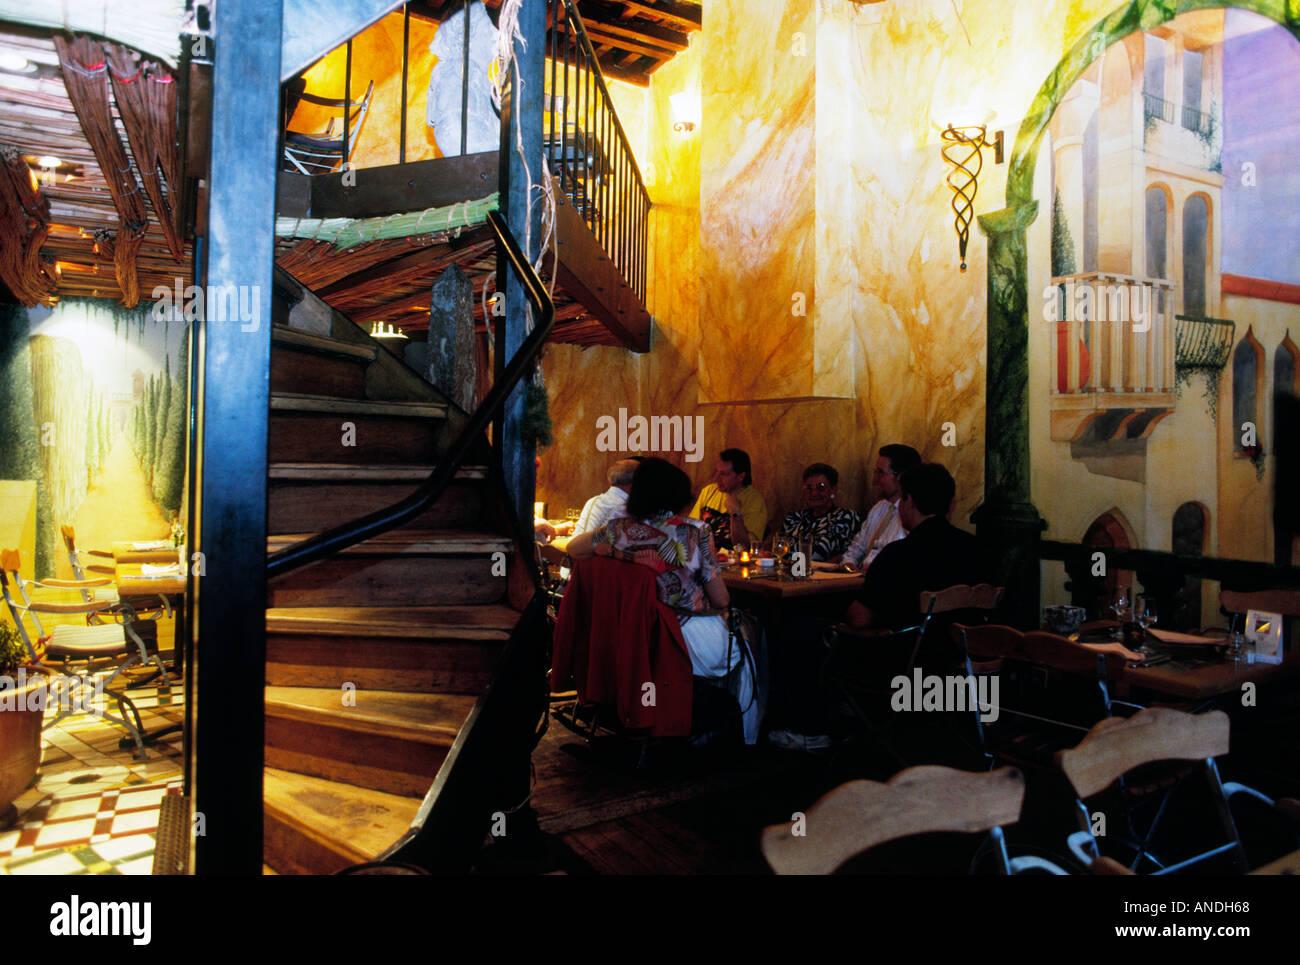 antwerp antwerpen anvers flander flanders flemish belgium europe benelux city town restaurant artistic atmosphere Stock Photo